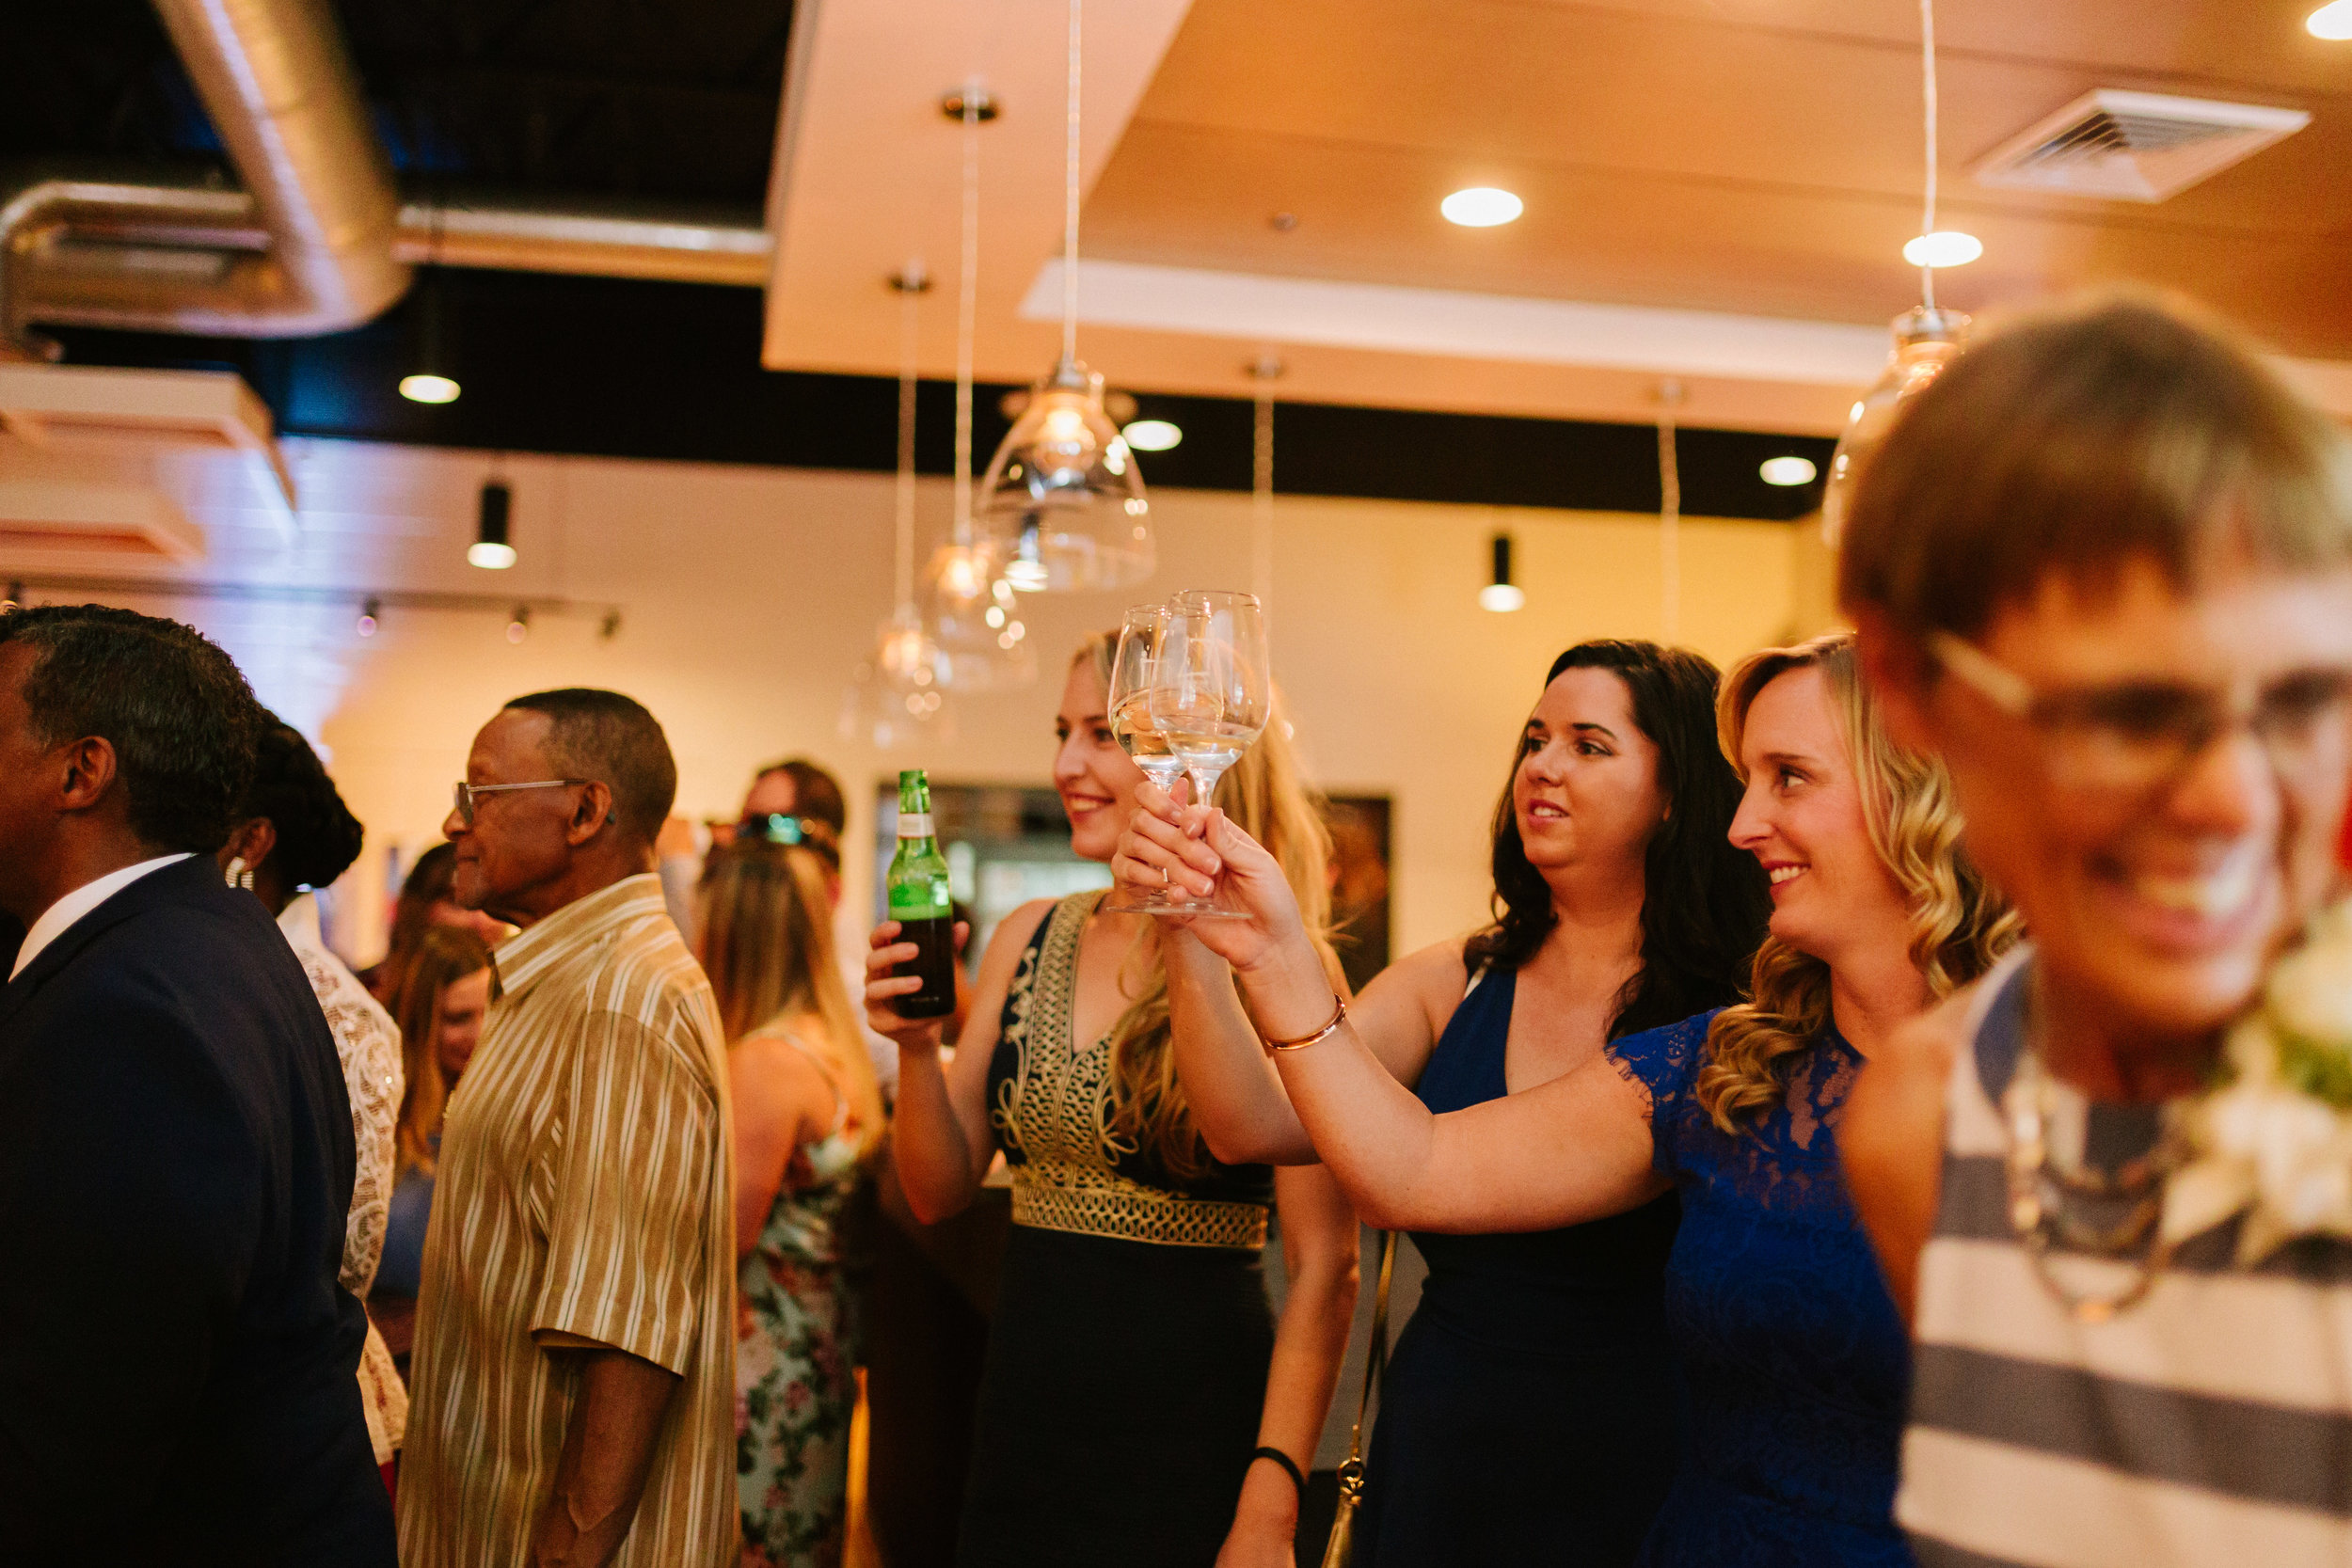 2017.09.16 Ashley and Chuck O'Day Quantam Leap Winery Wedding (352 of 462).jpg